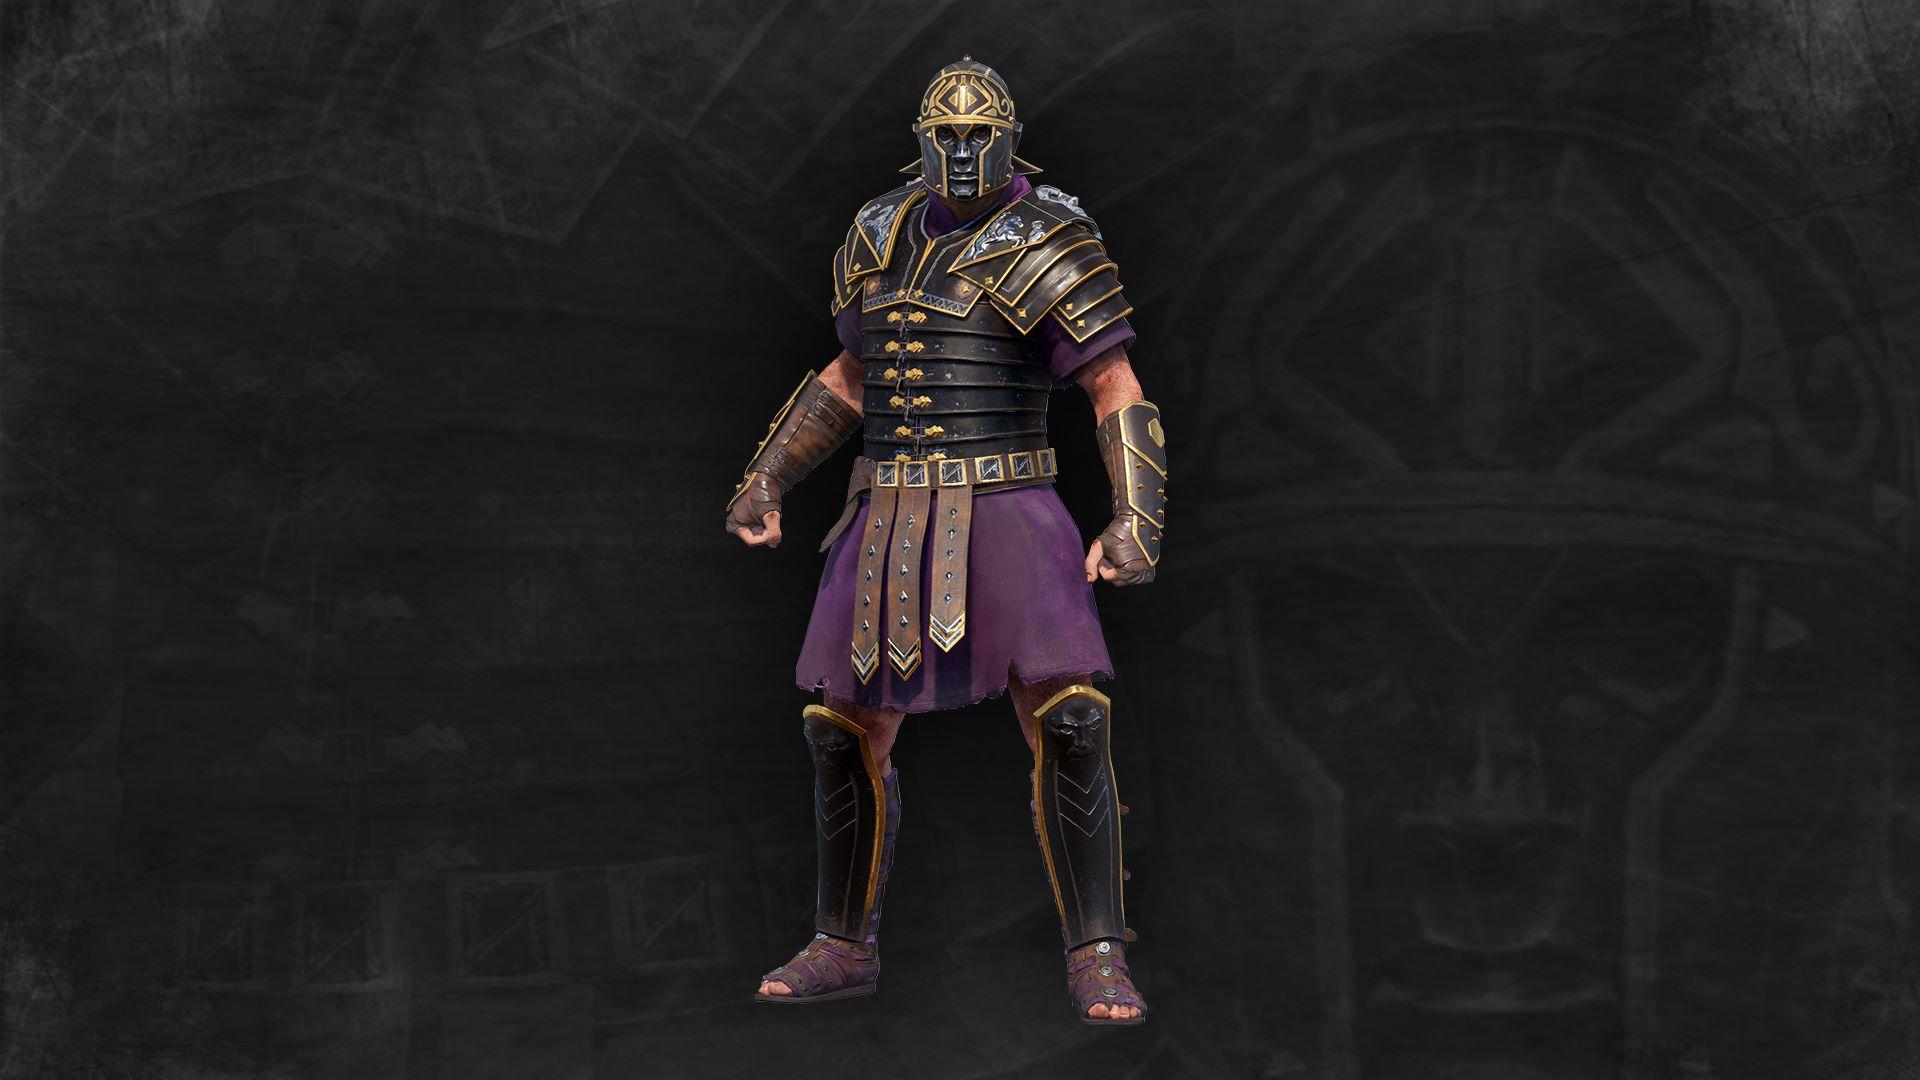 Praetorian Gladiator Skin